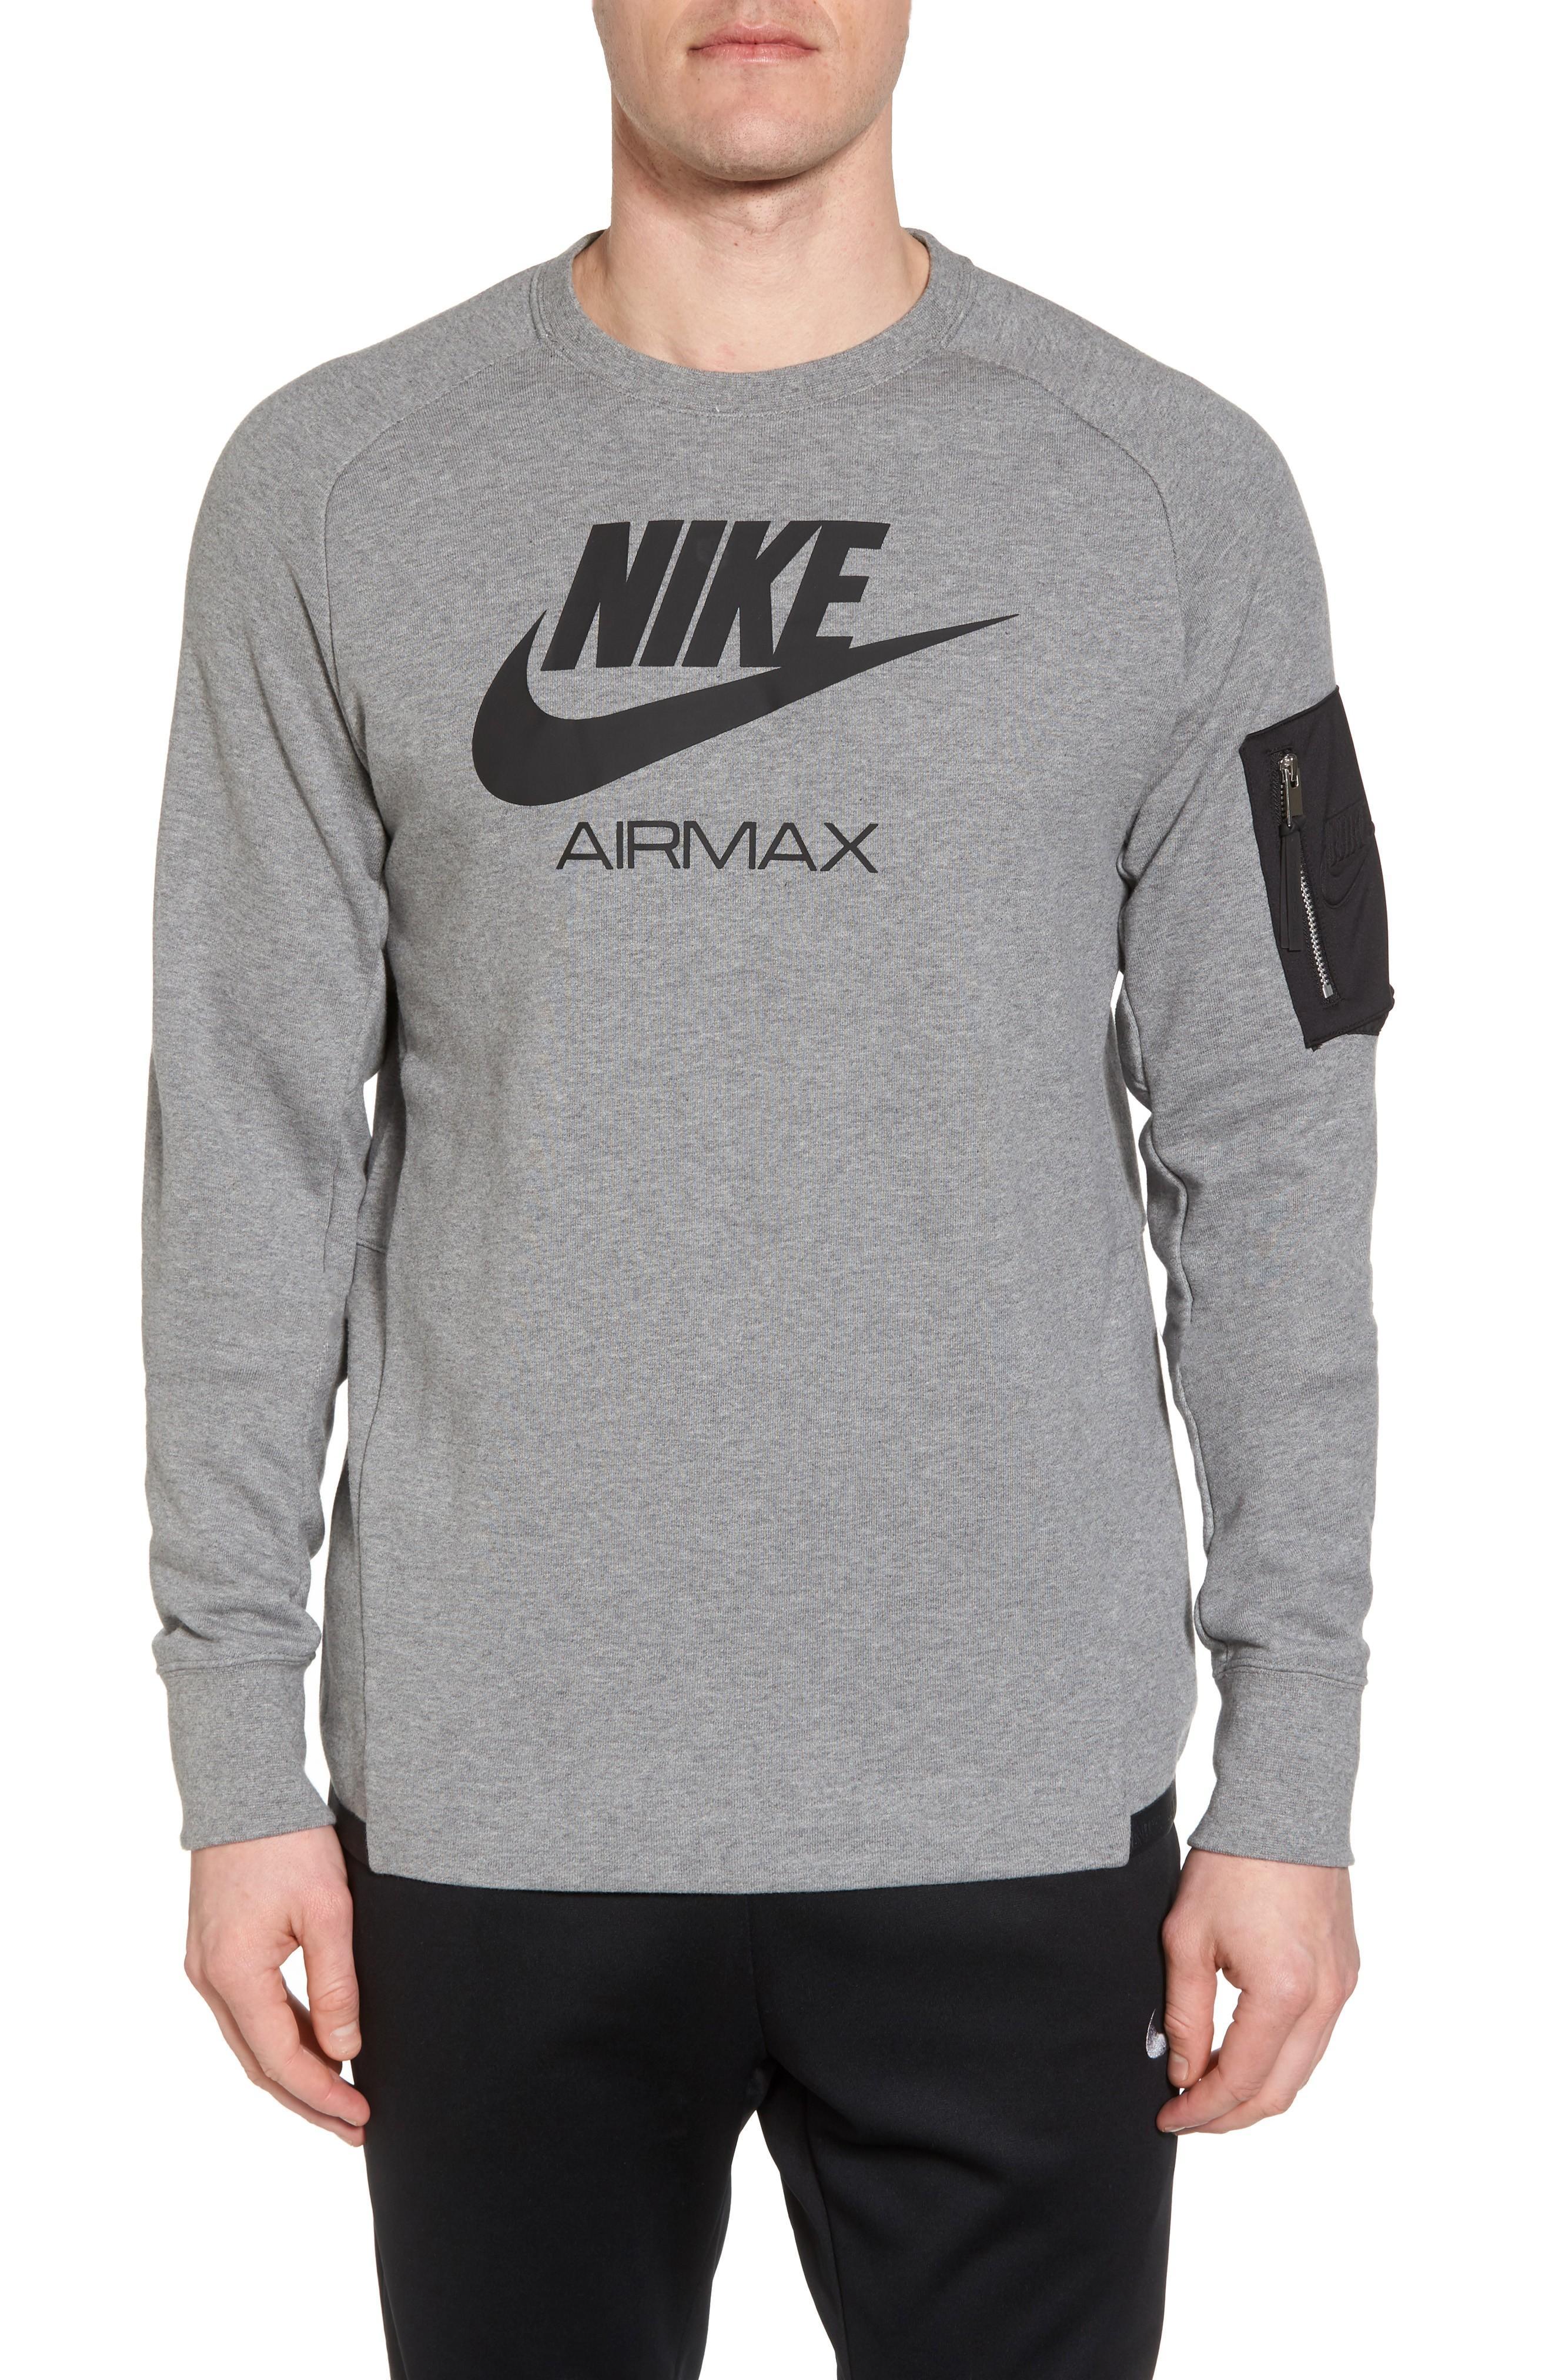 52419c5e61 Nike Nsw Air Max Crewneck Sweatshirt In Carbon Heather  Black  Black ...